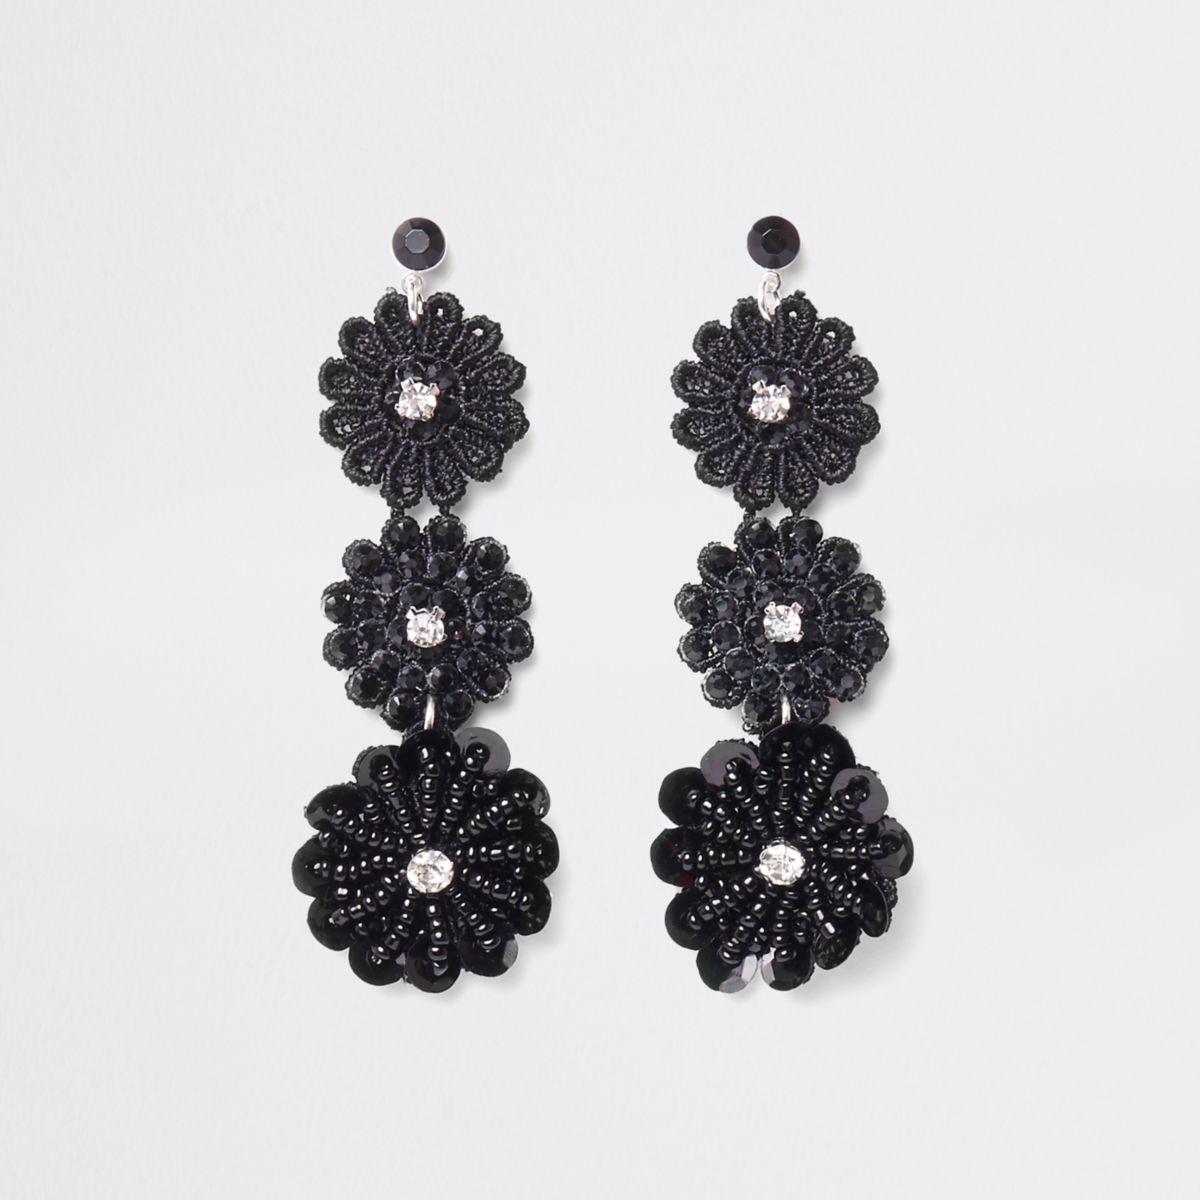 Black floral lace drop stud earrings